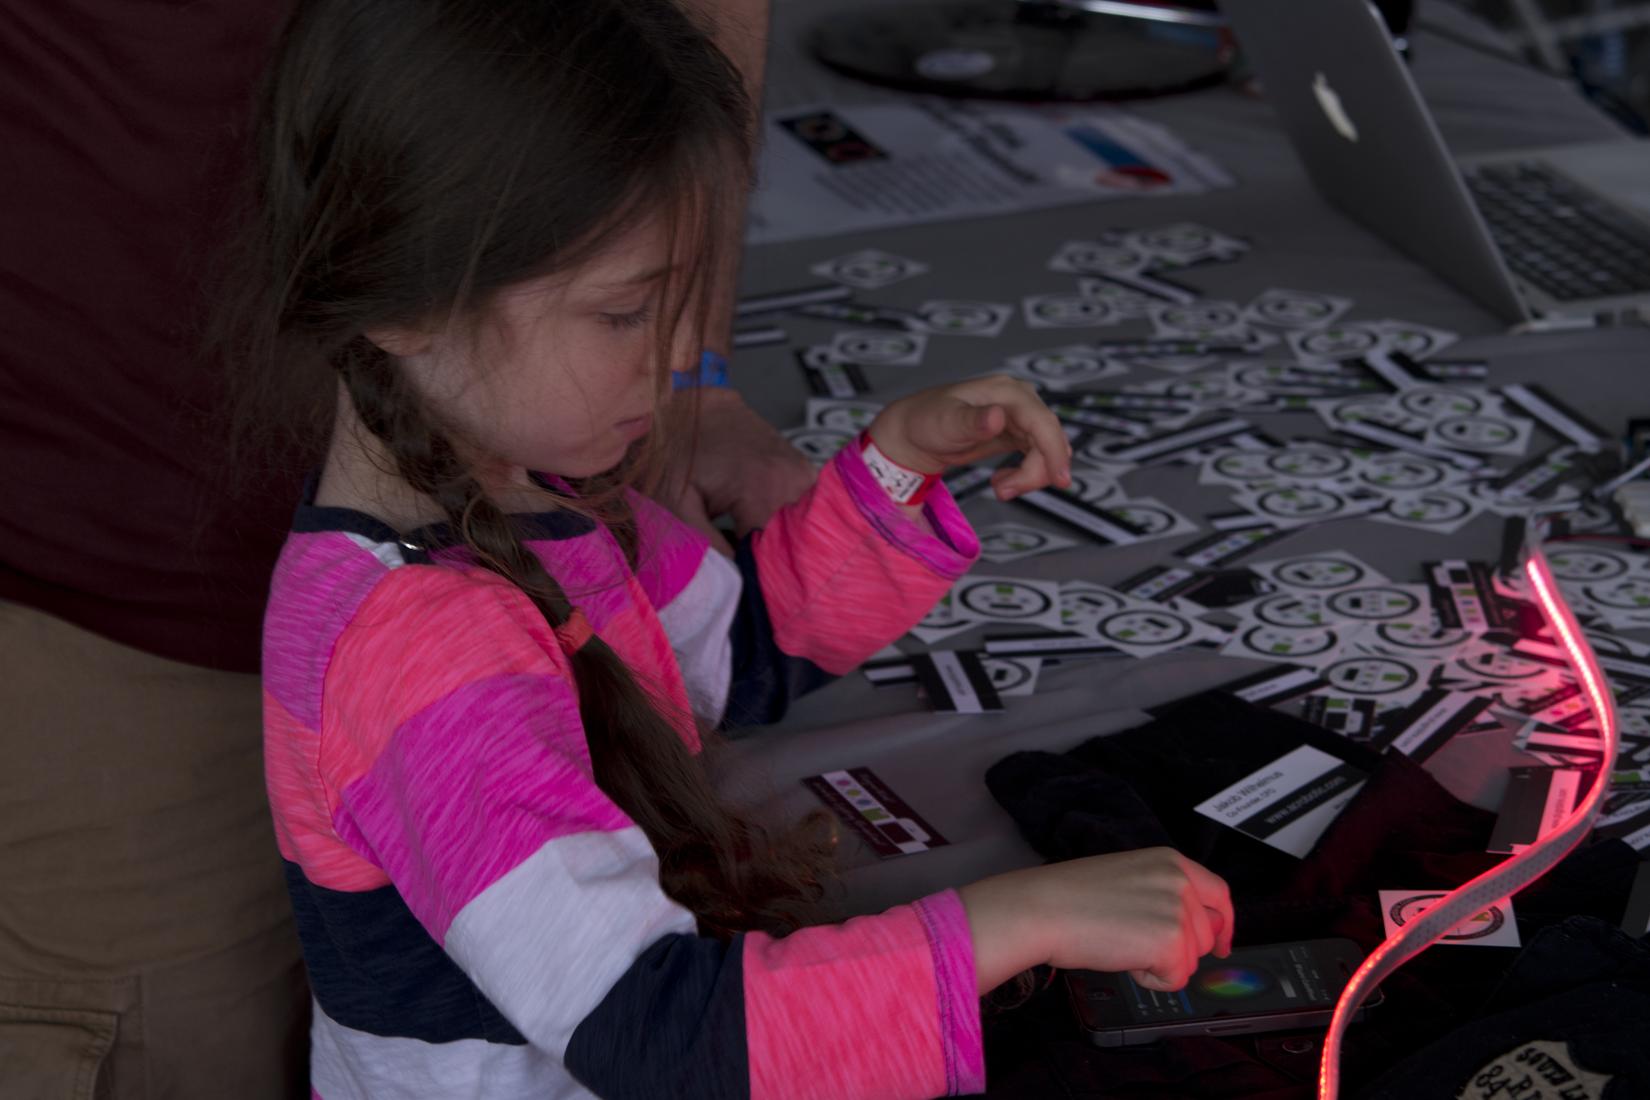 Upcoming Kickstarter Plug-n-Blink being demoed at Maker Faire Bay Area '14.